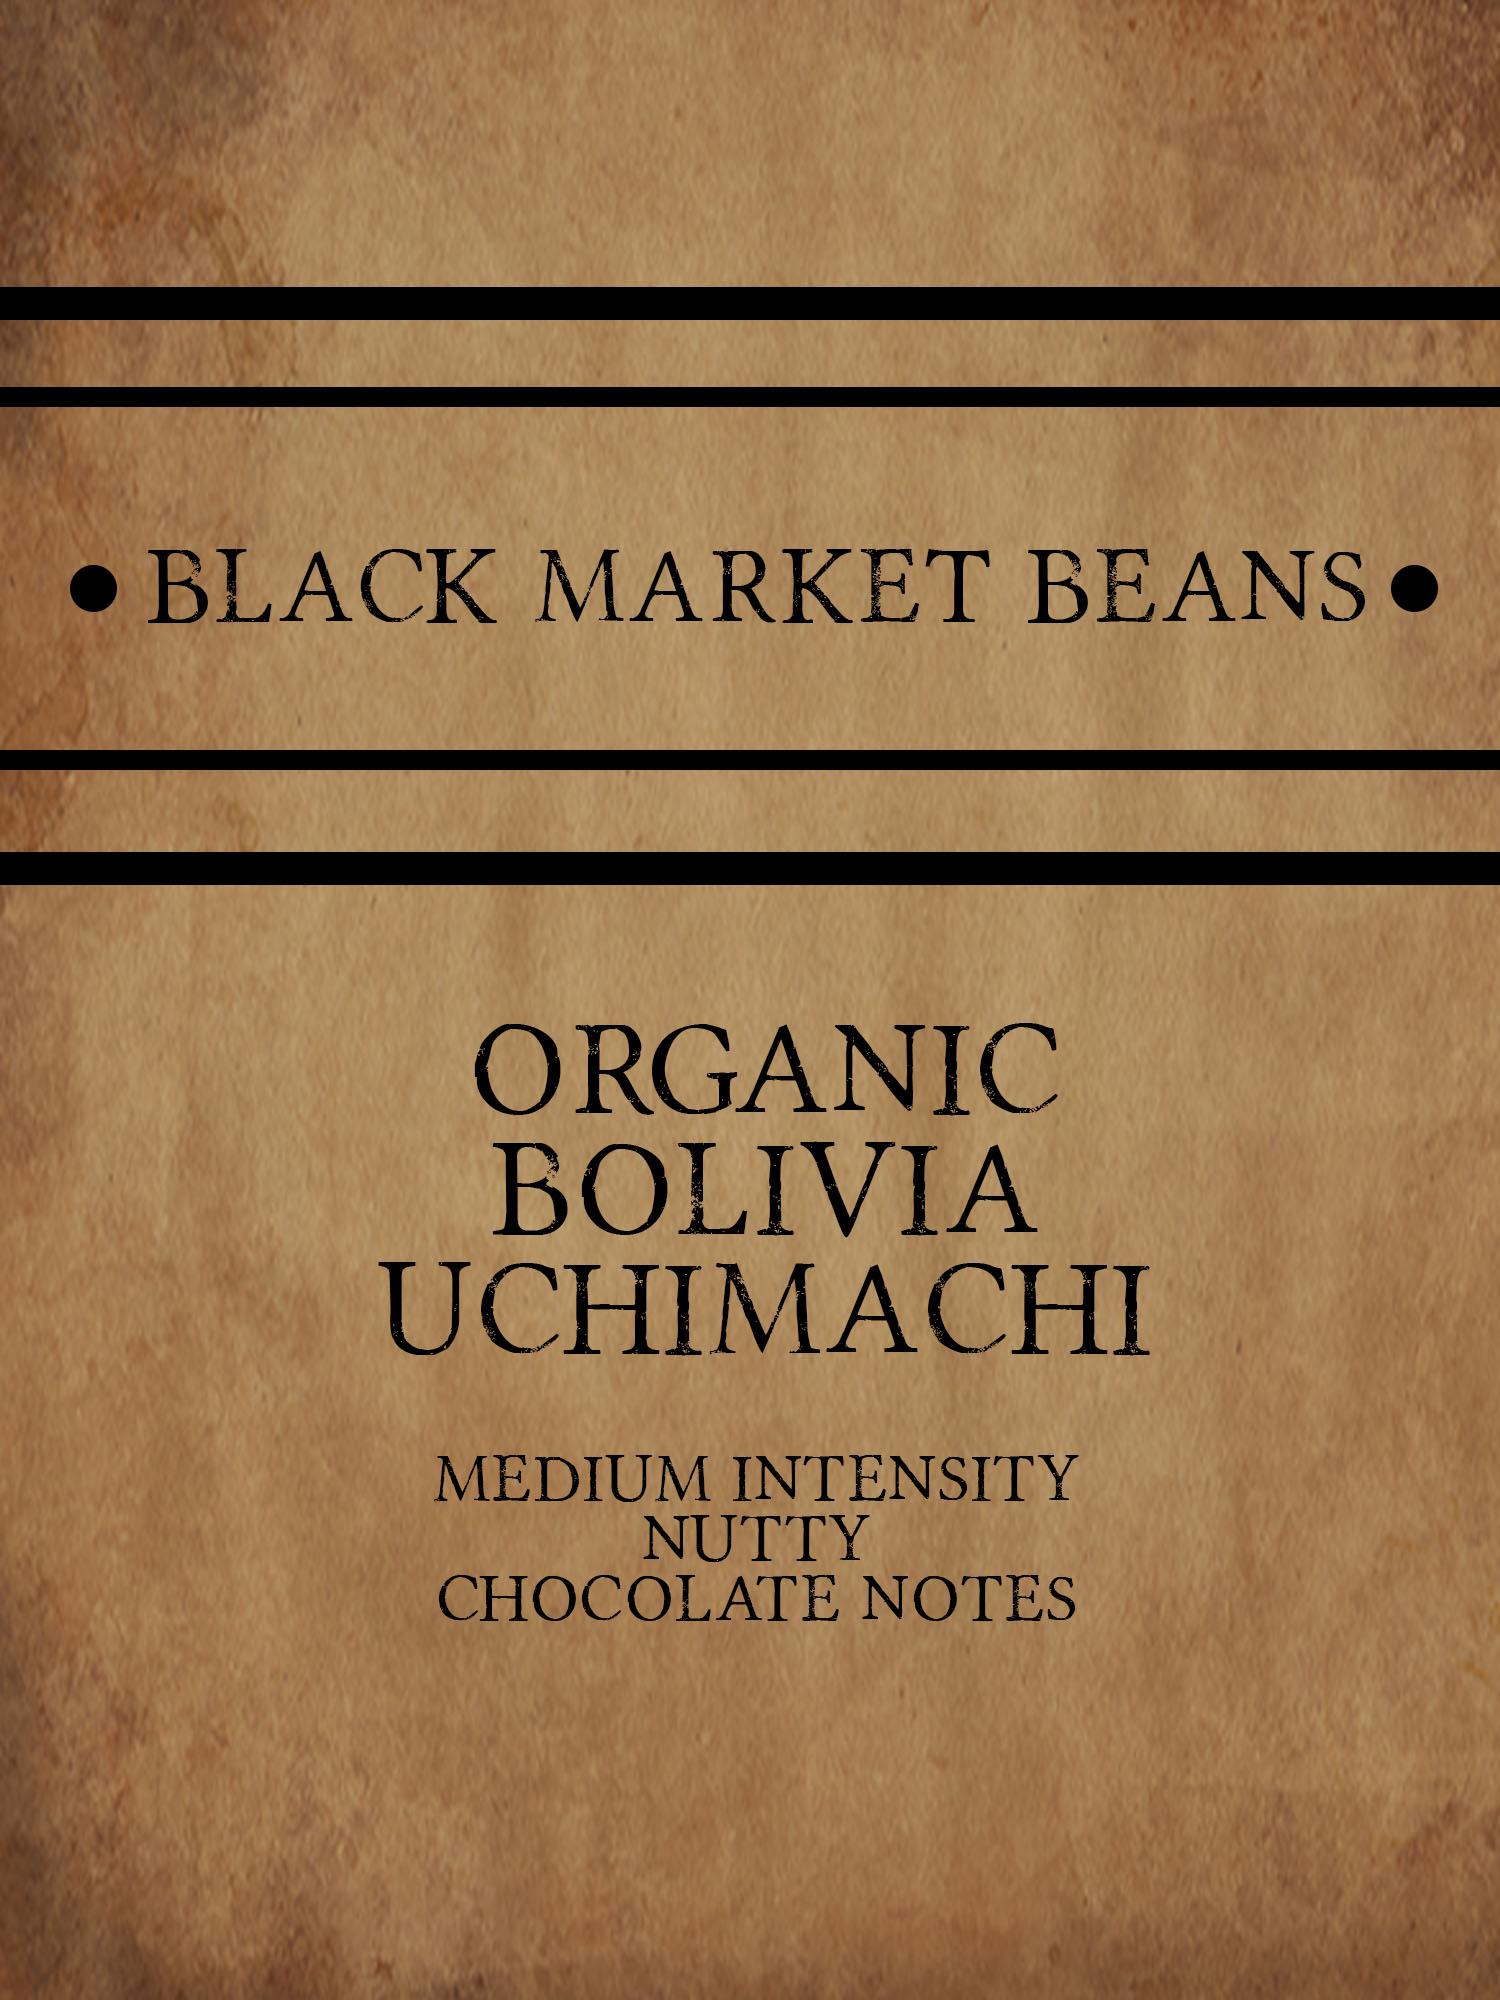 coffee_card_Bolivia_uchamachi.jpg